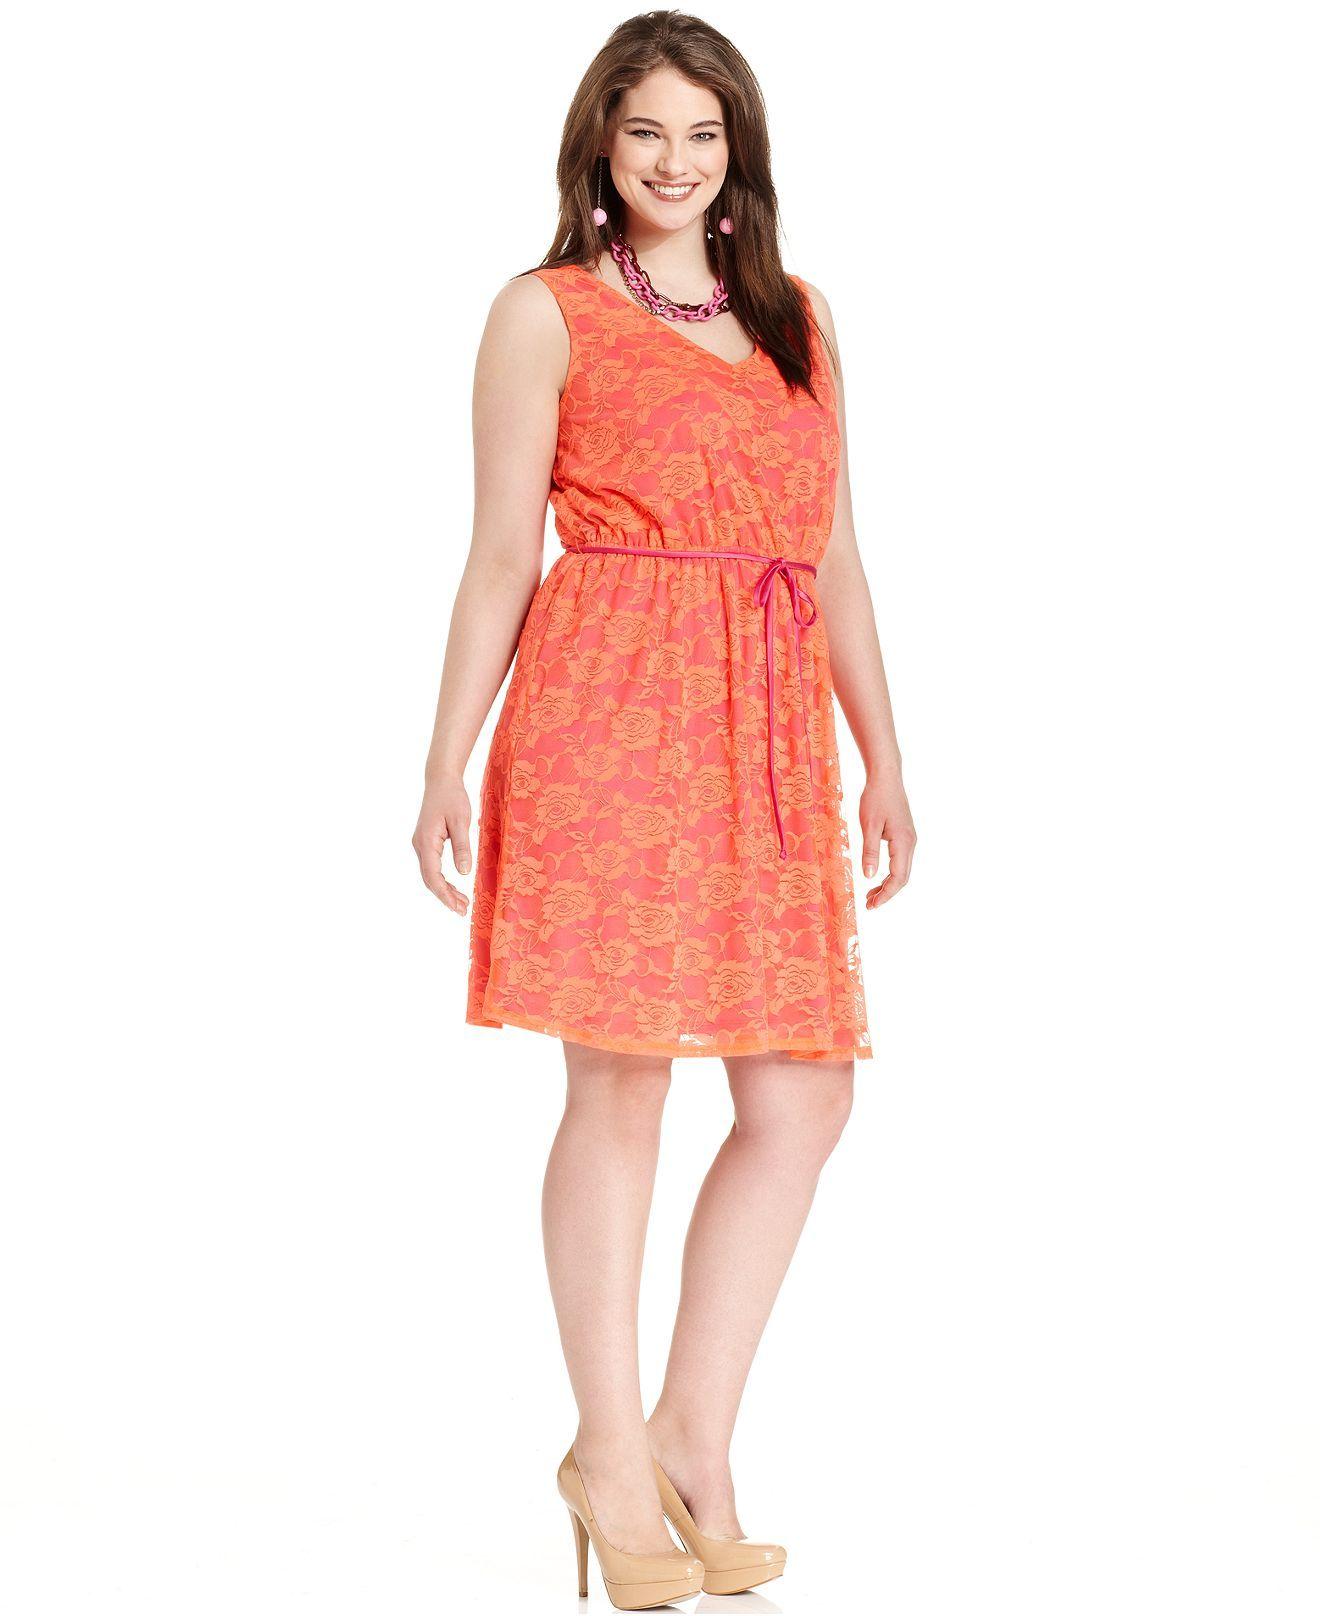 Lace dress macys  Love Squared Plus Size Dress Sleeveless Lace Belted  Plus Size